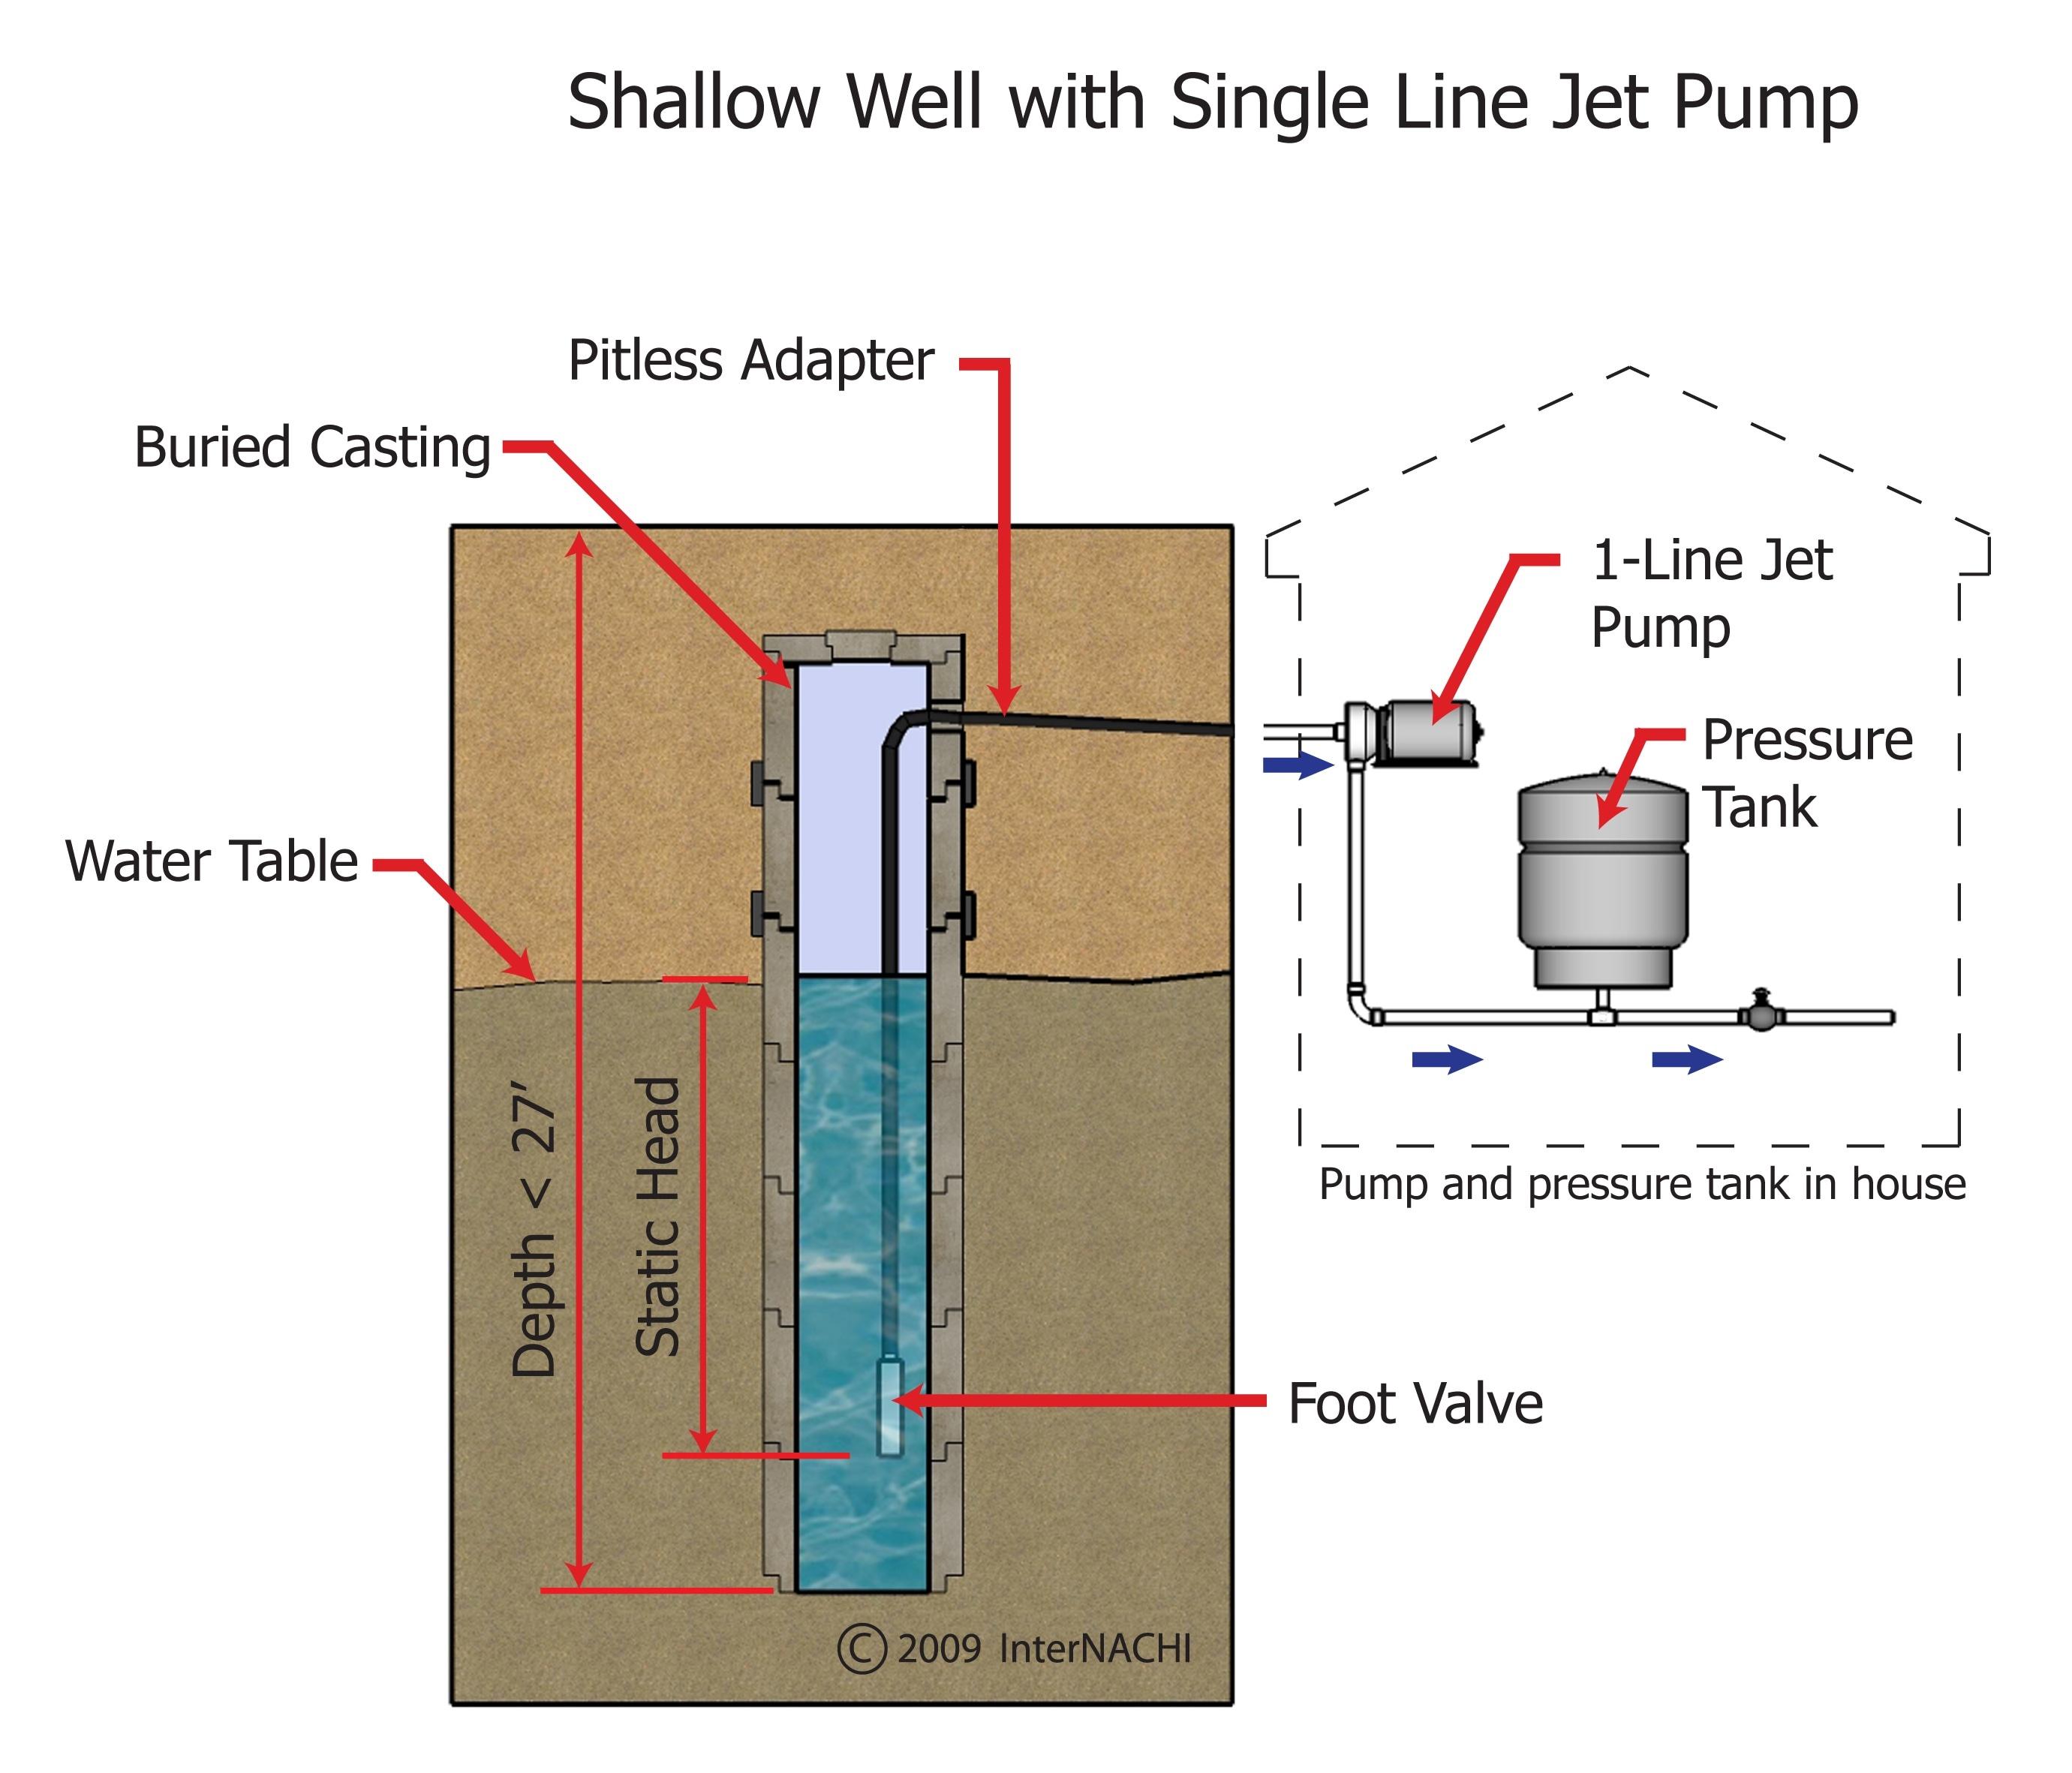 Index of galleryimagesplumbinggeneral shallow well pumpg pooptronica Images